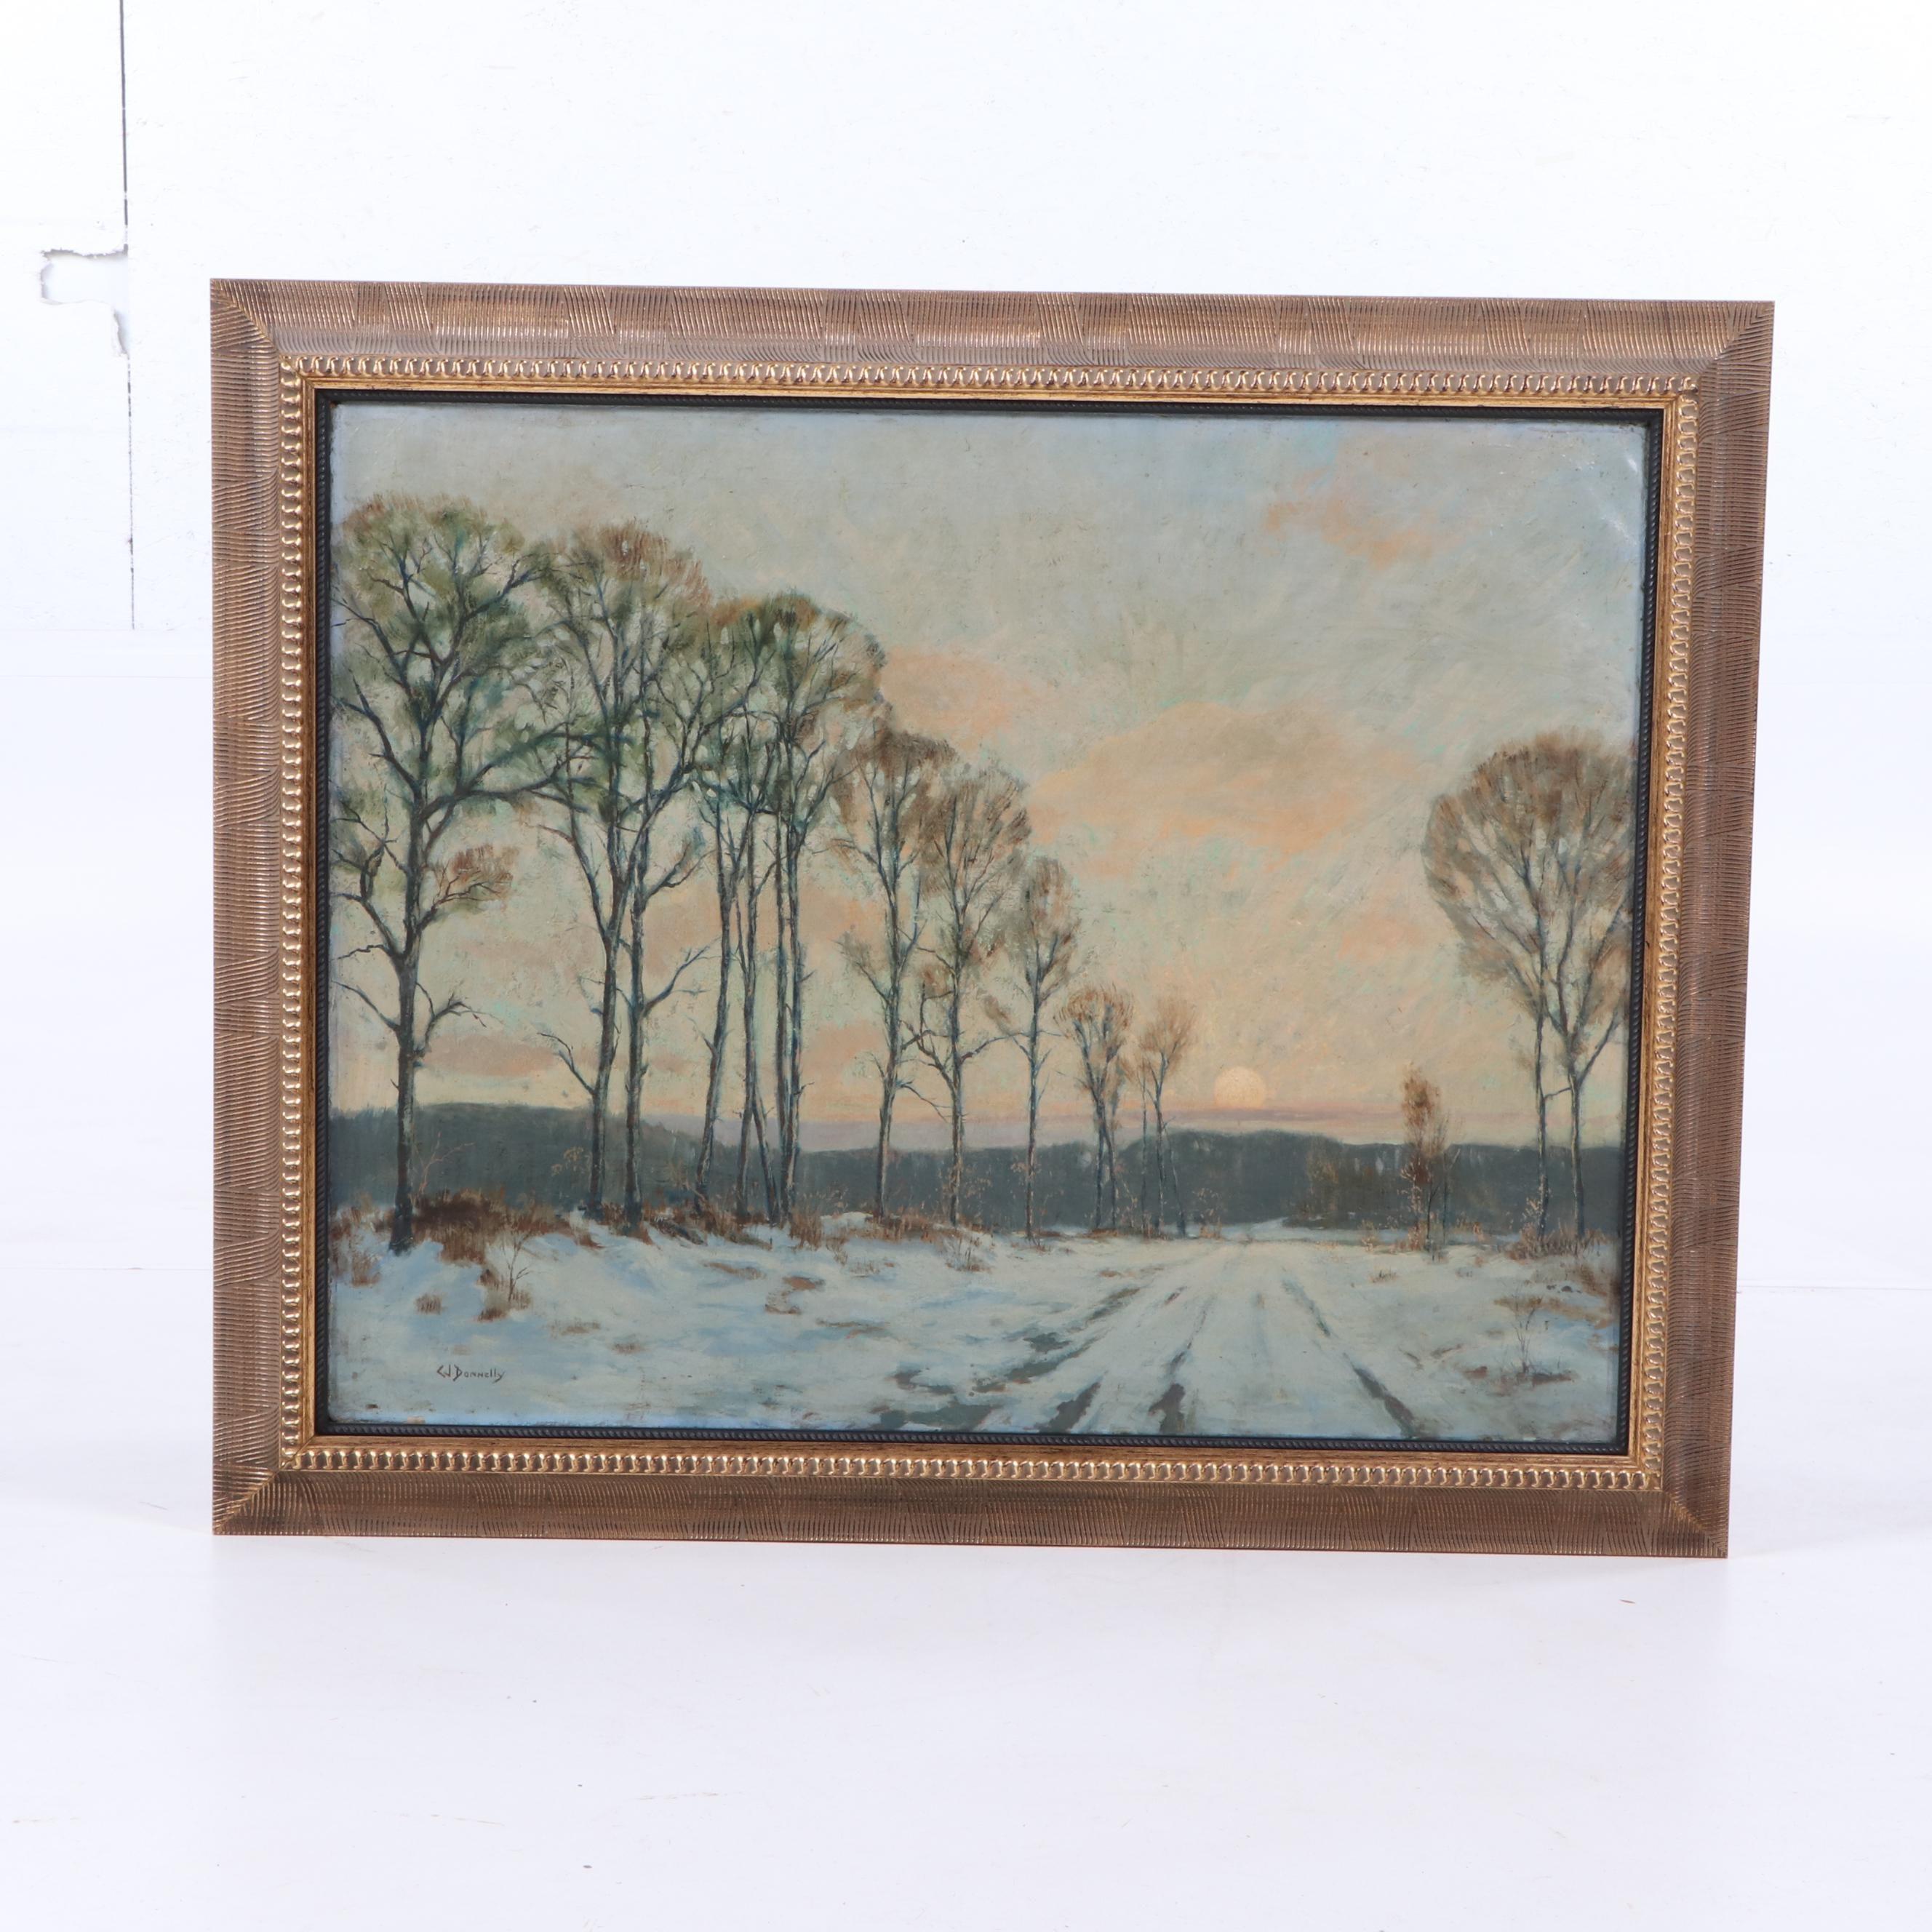 C.J. Donnelly Winter Landscape Oil Painting